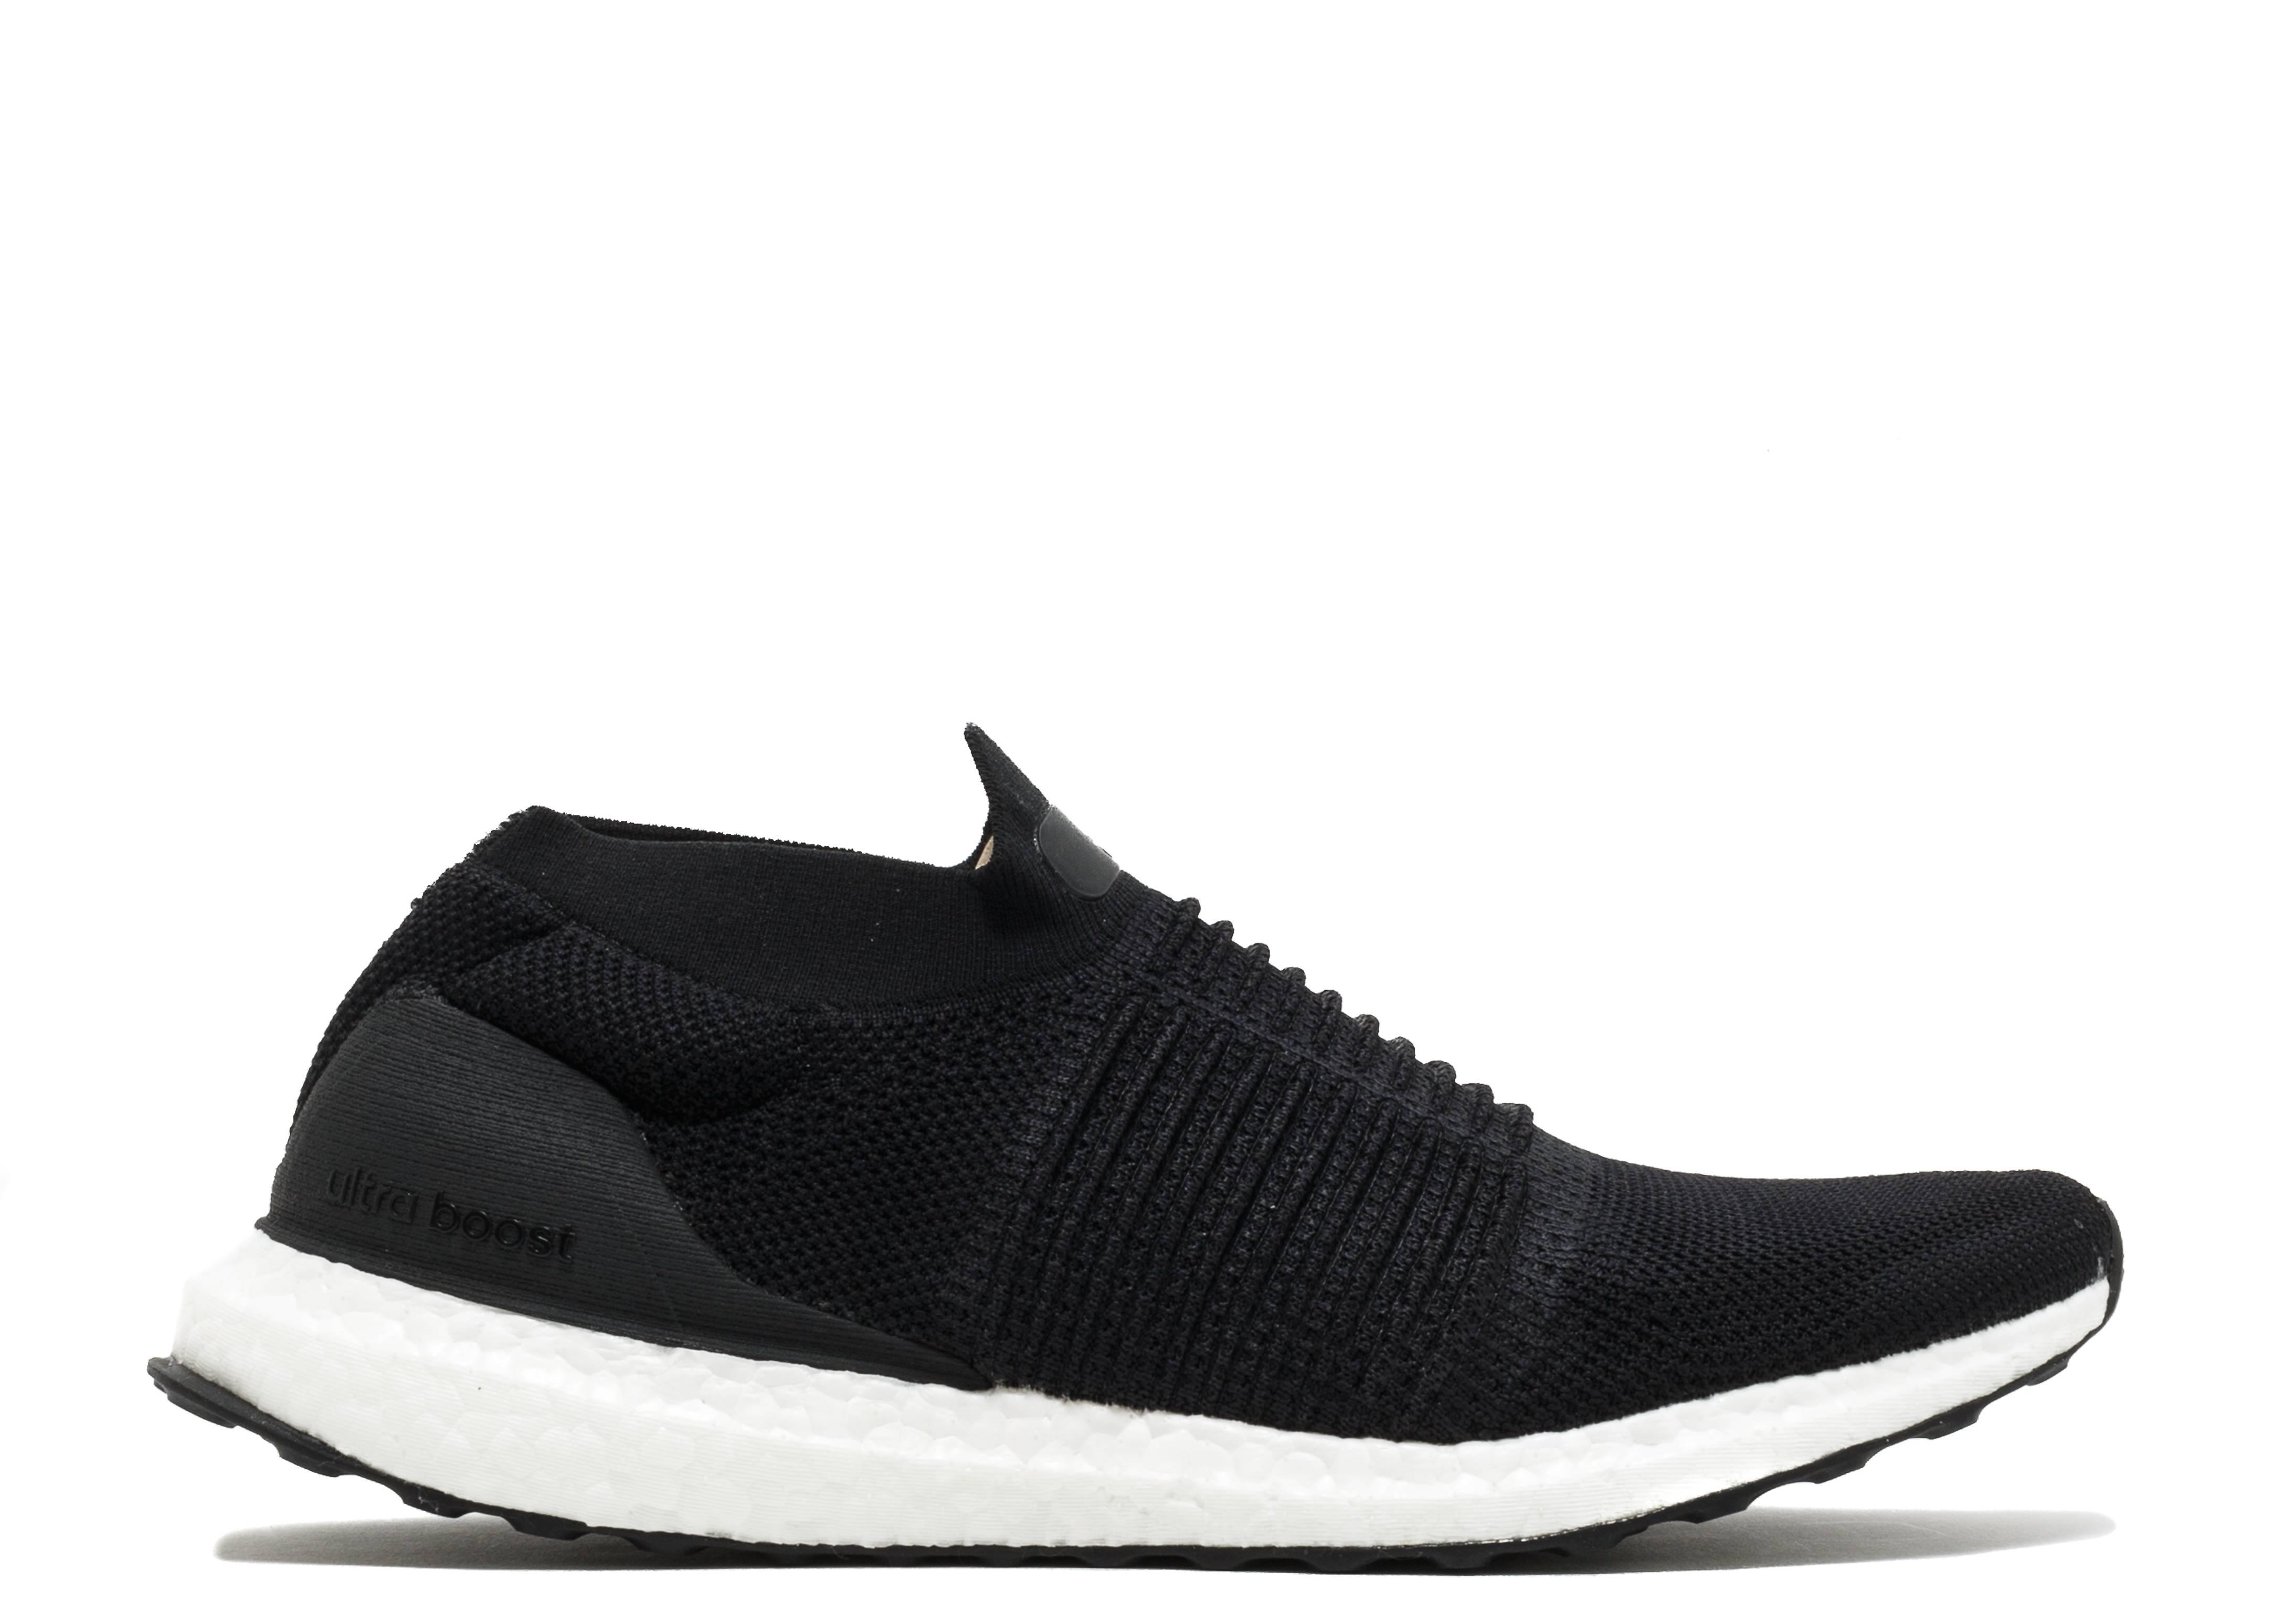 Adidas Men's Ultraboost Laceless NEW AUTHENTIC Black/Black-White S80770